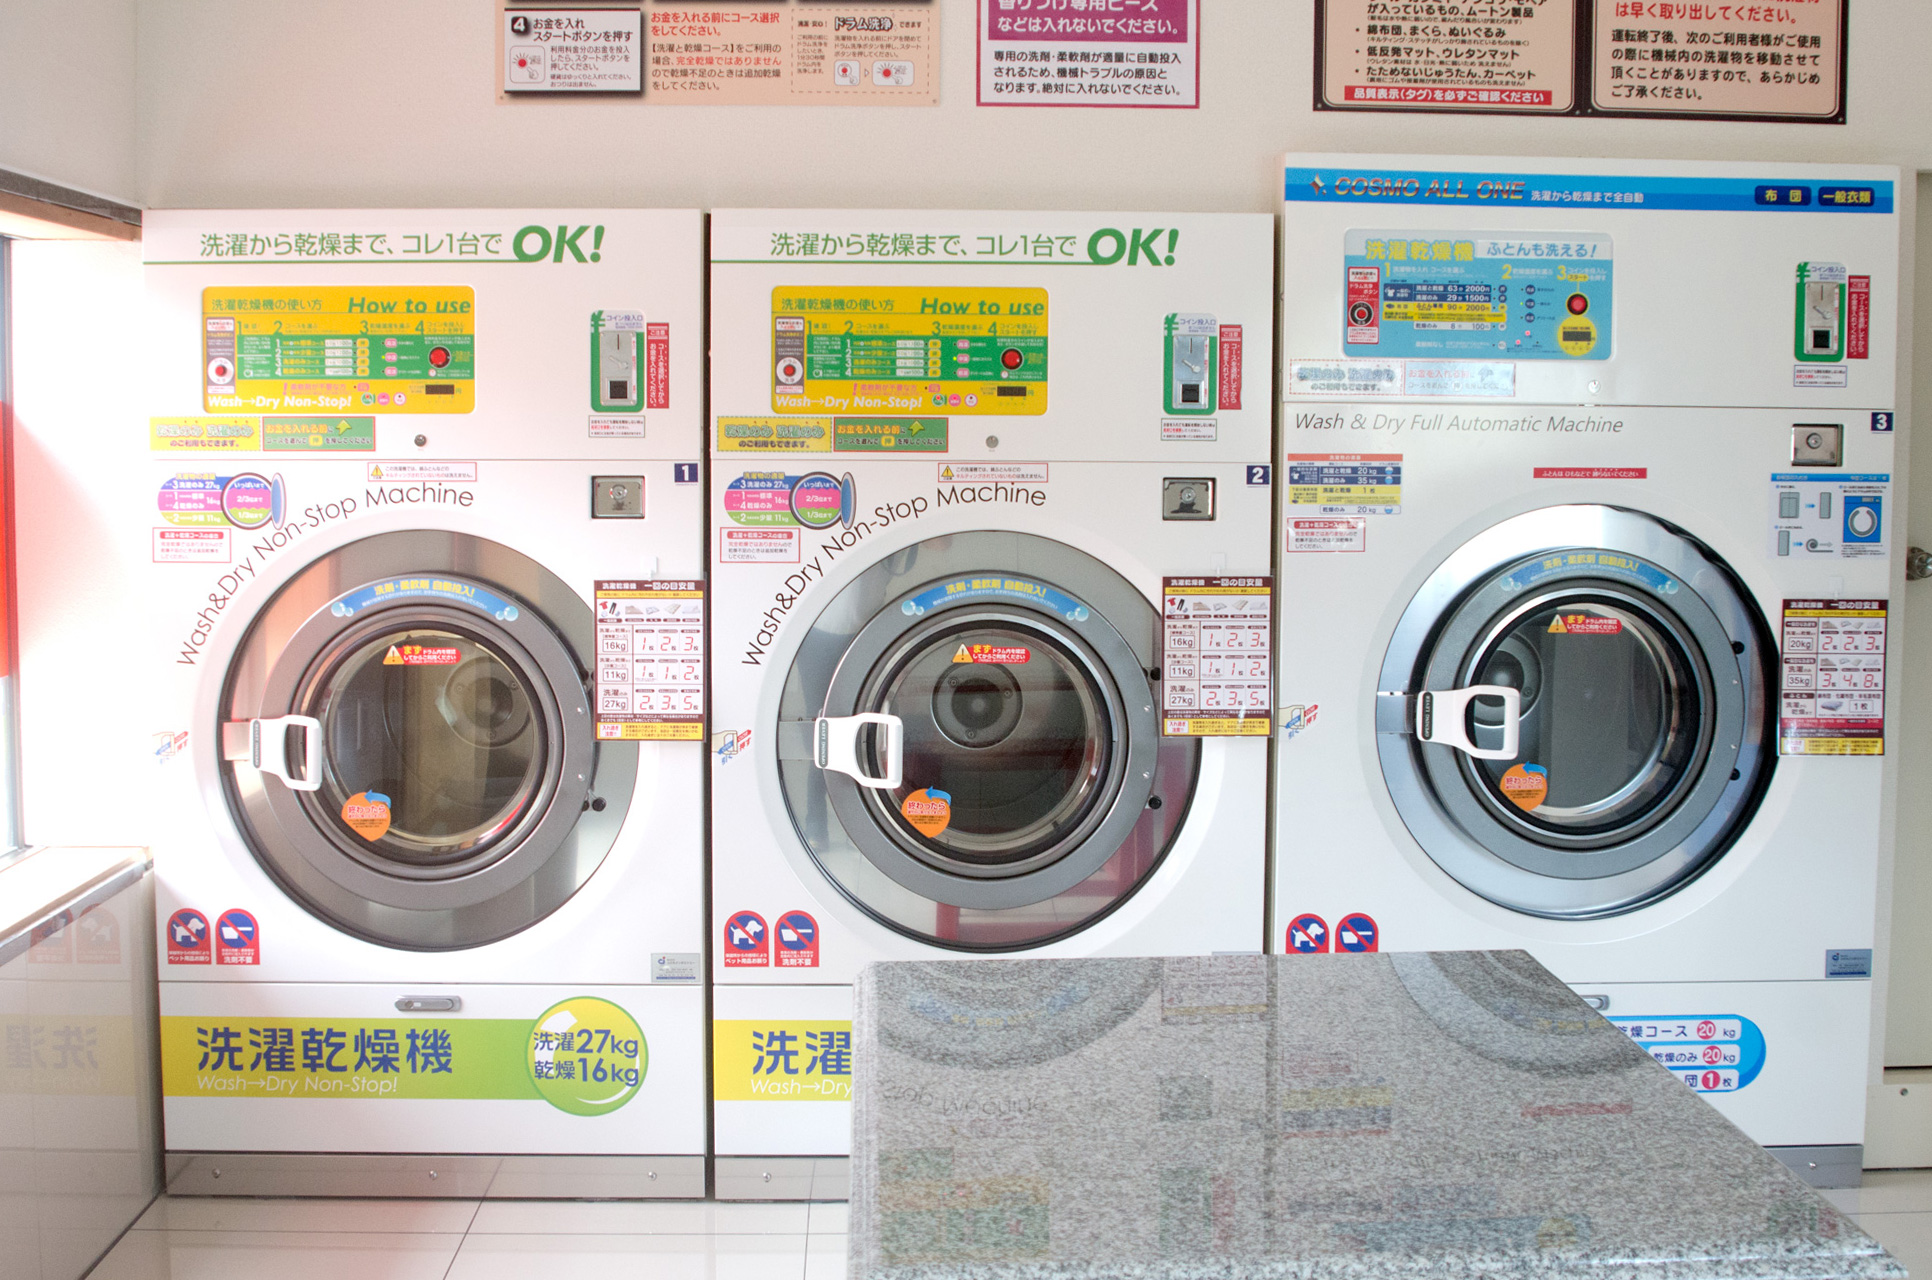 大型洗濯乾燥機コーナー